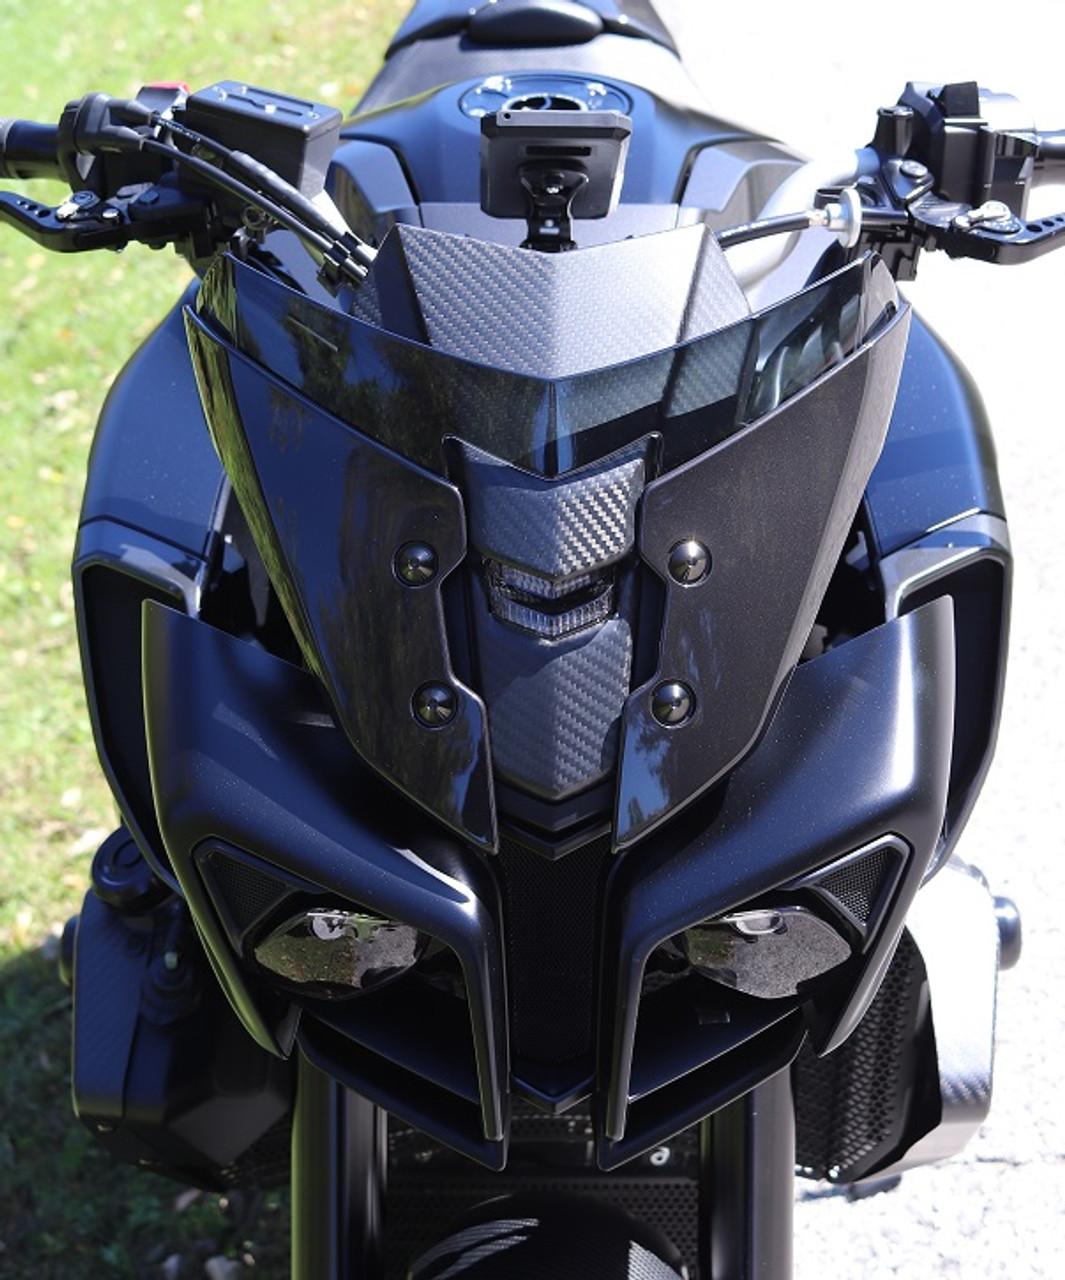 2x2 twill 2017-2018 Yamaha FZ10 MT10 Carbon Fiber Front Upper Windscreen